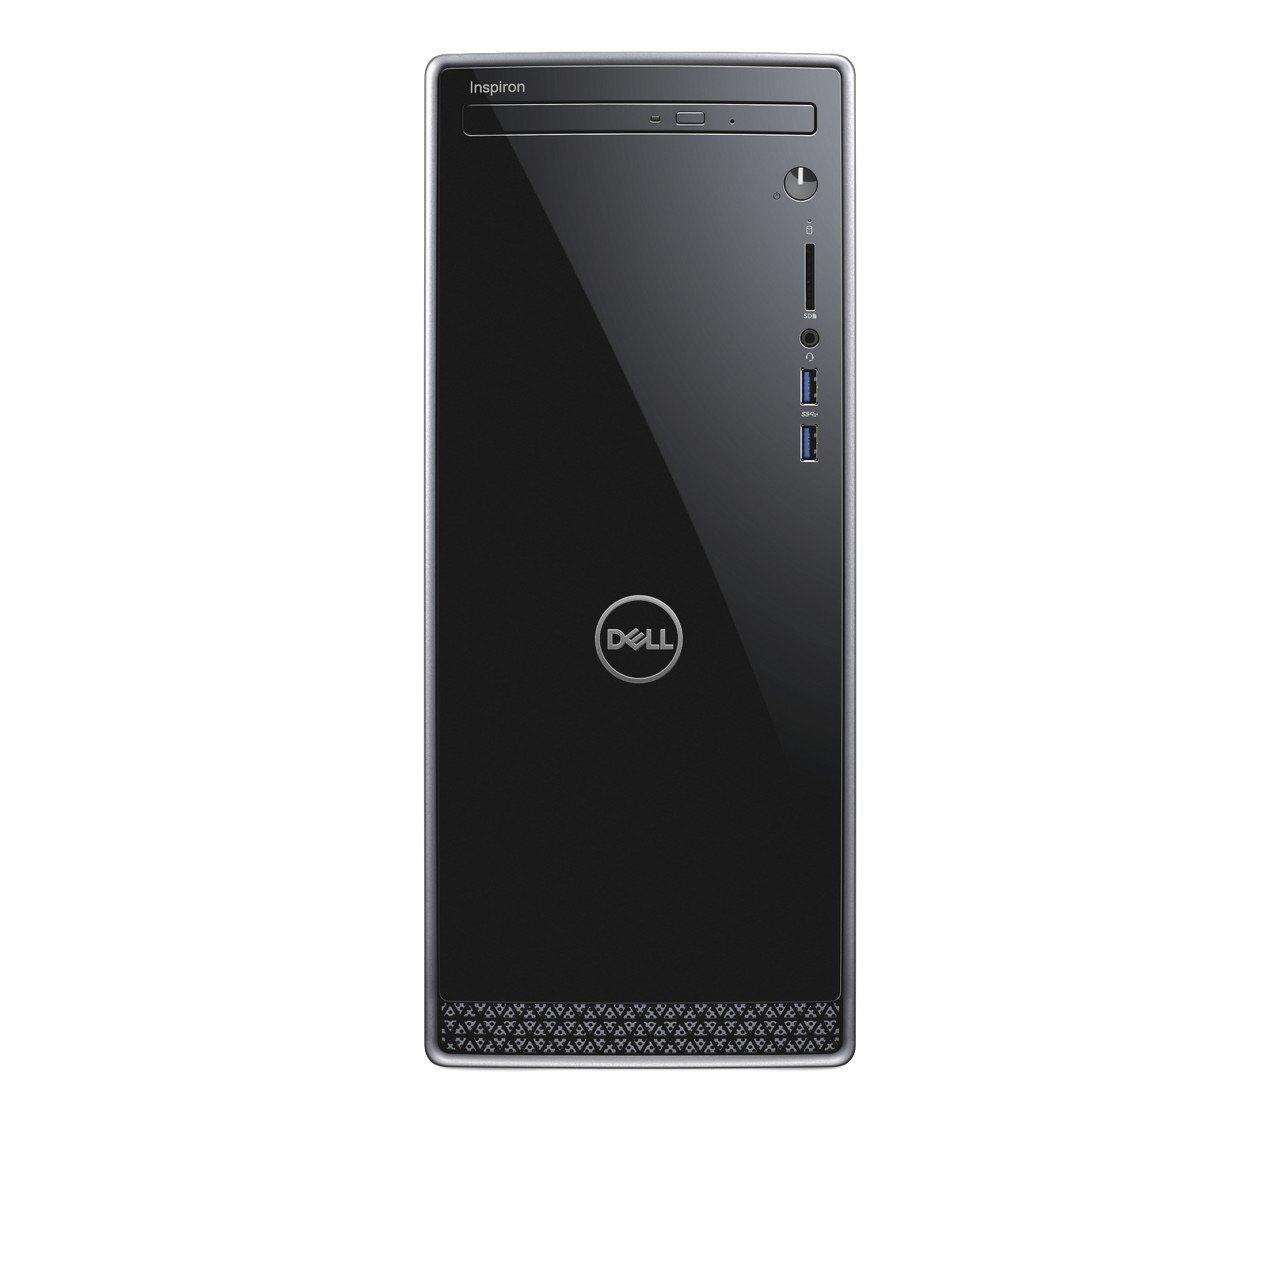 Dell Inspiron Desktop: 17-8700 1TB HDD(7200 rpm) & 24GB Memory(8GB DDR4+16GB Intel Optane) $599 AC +F/S